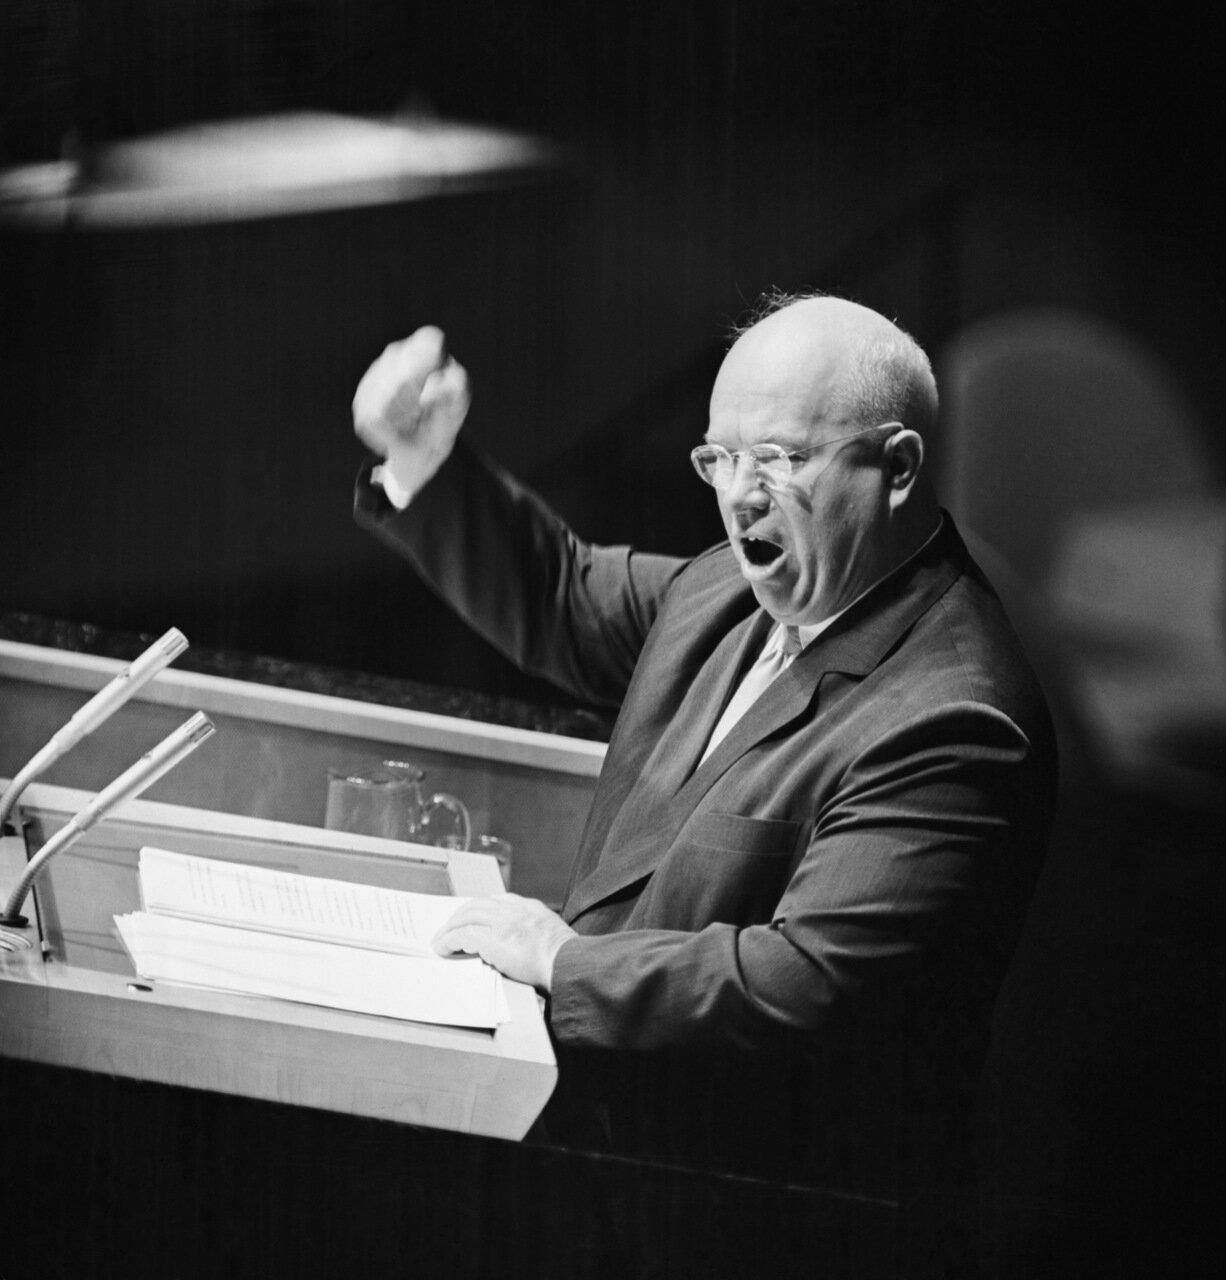 Россия угрожает международному порядку, - постпред США при ООН Пауэр - Цензор.НЕТ 58